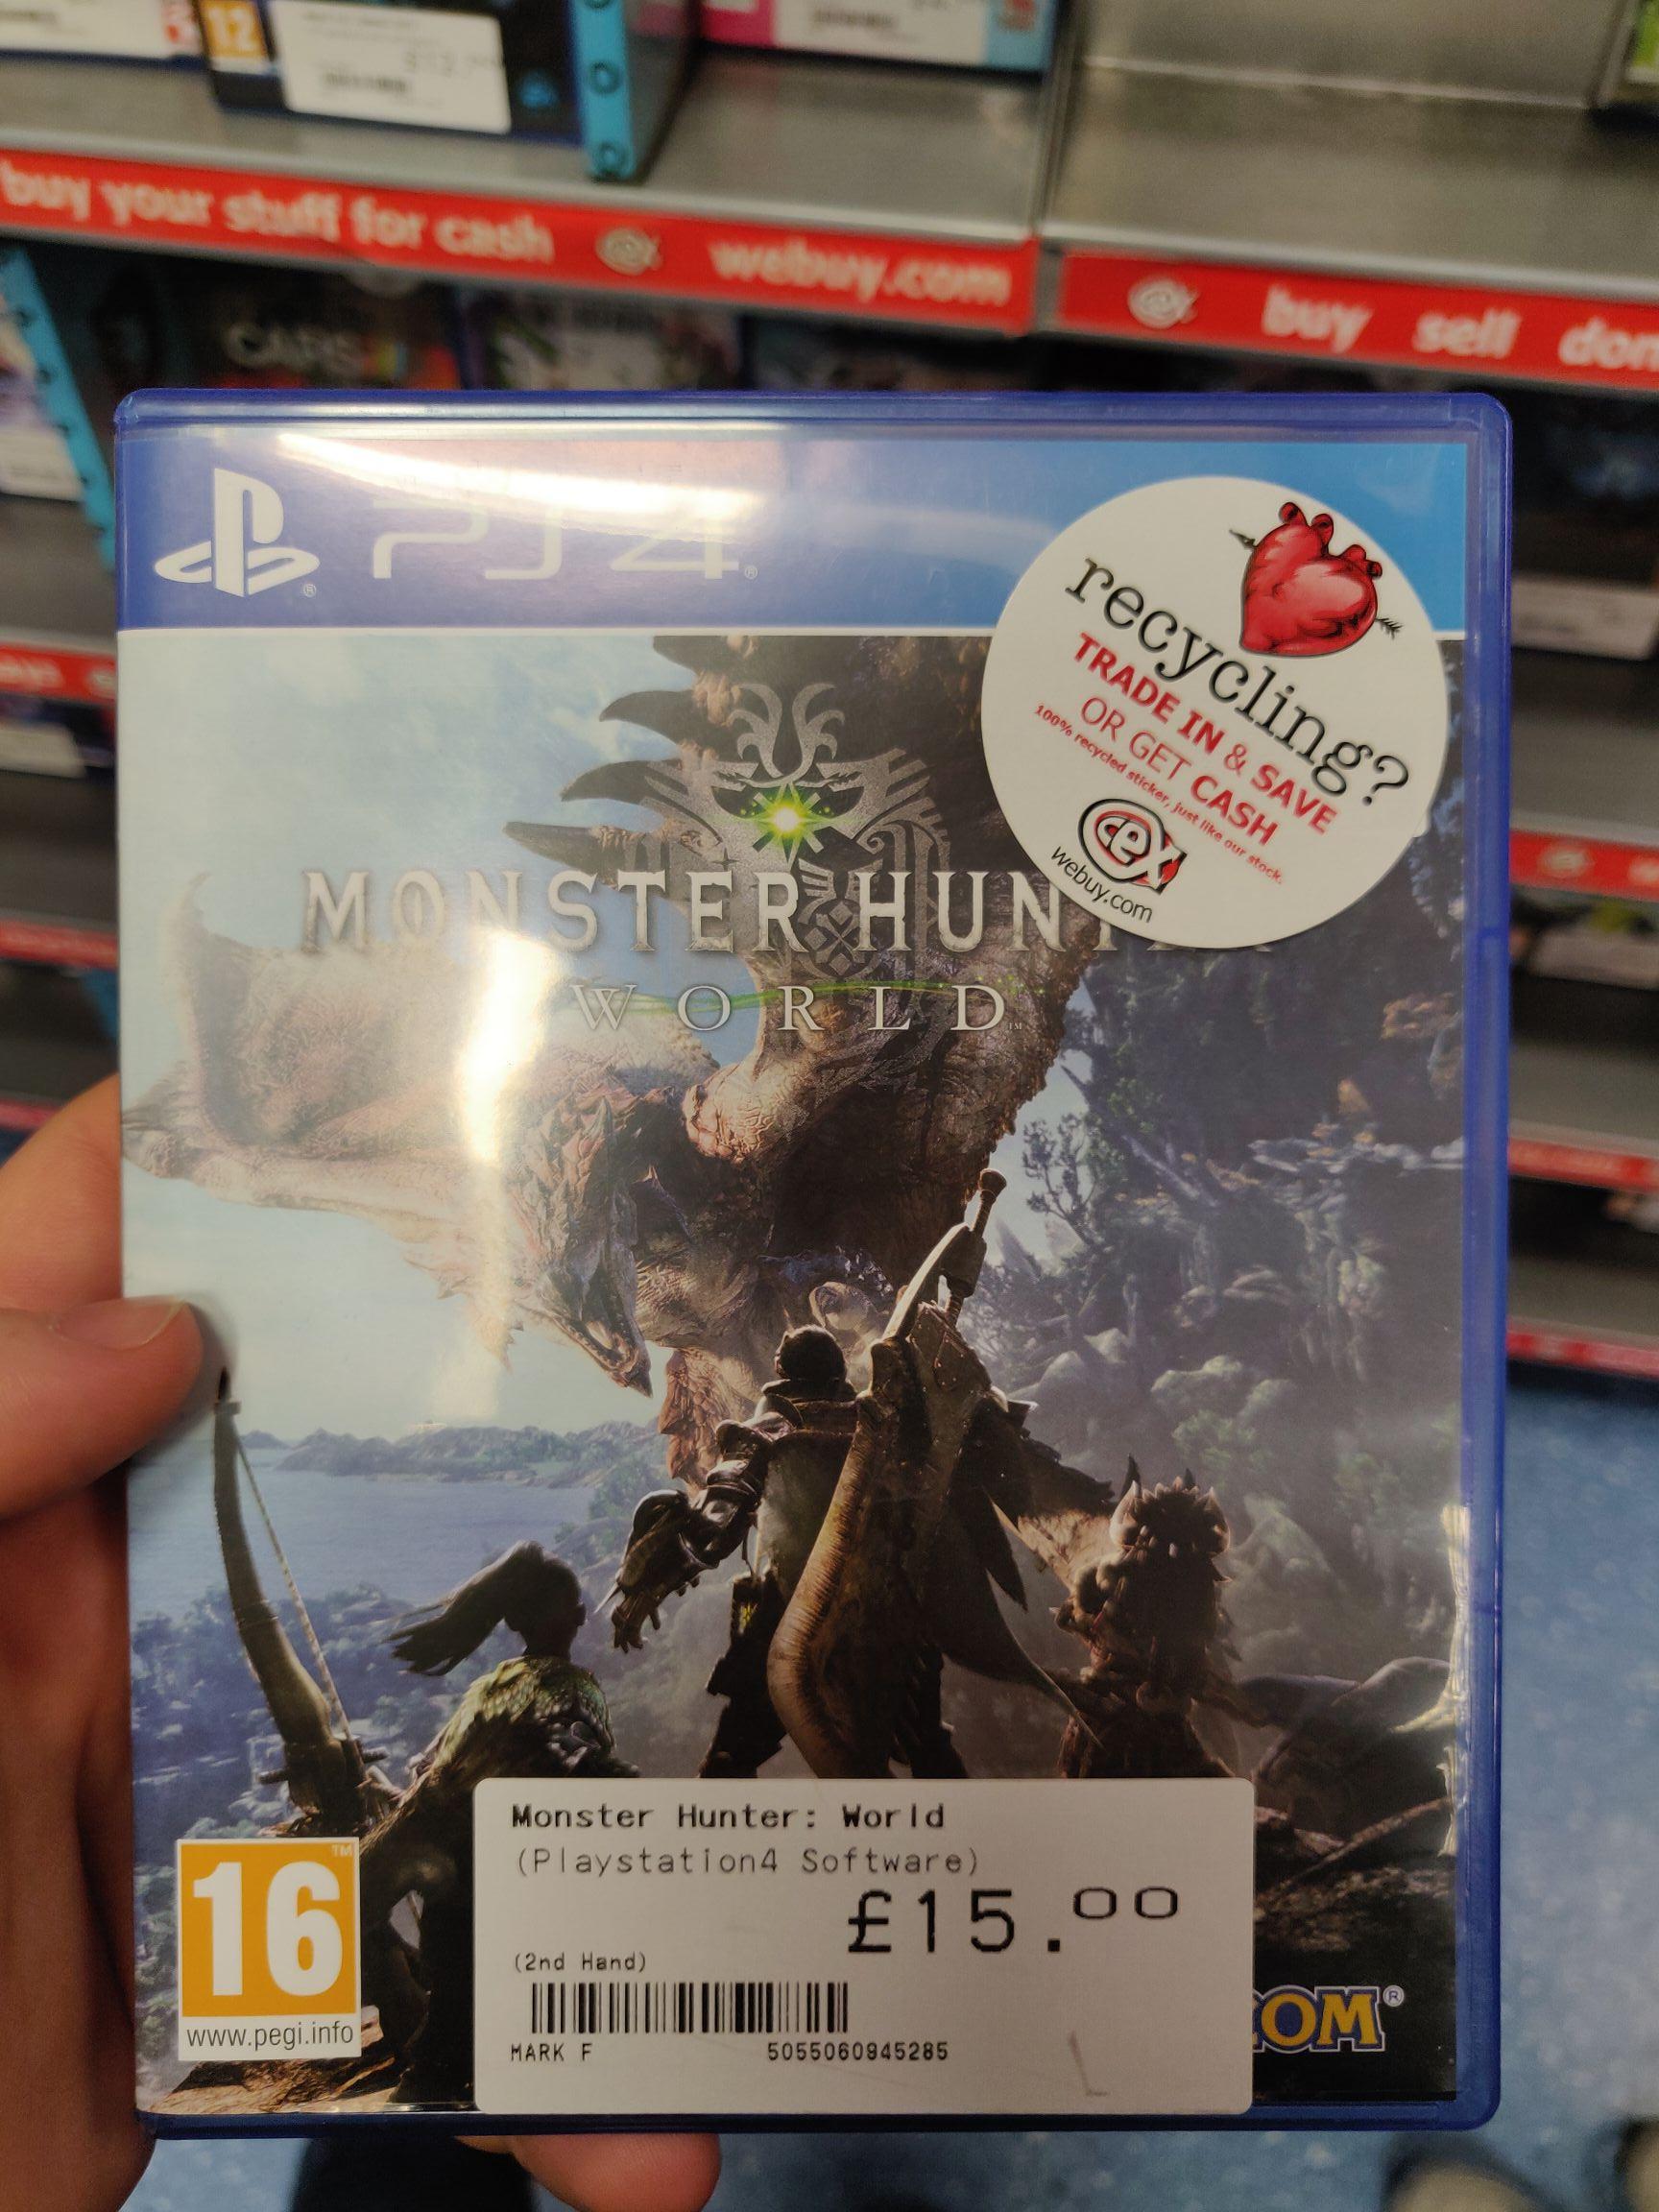 Monster Hunter World £15 @ CEX (pre-owned)